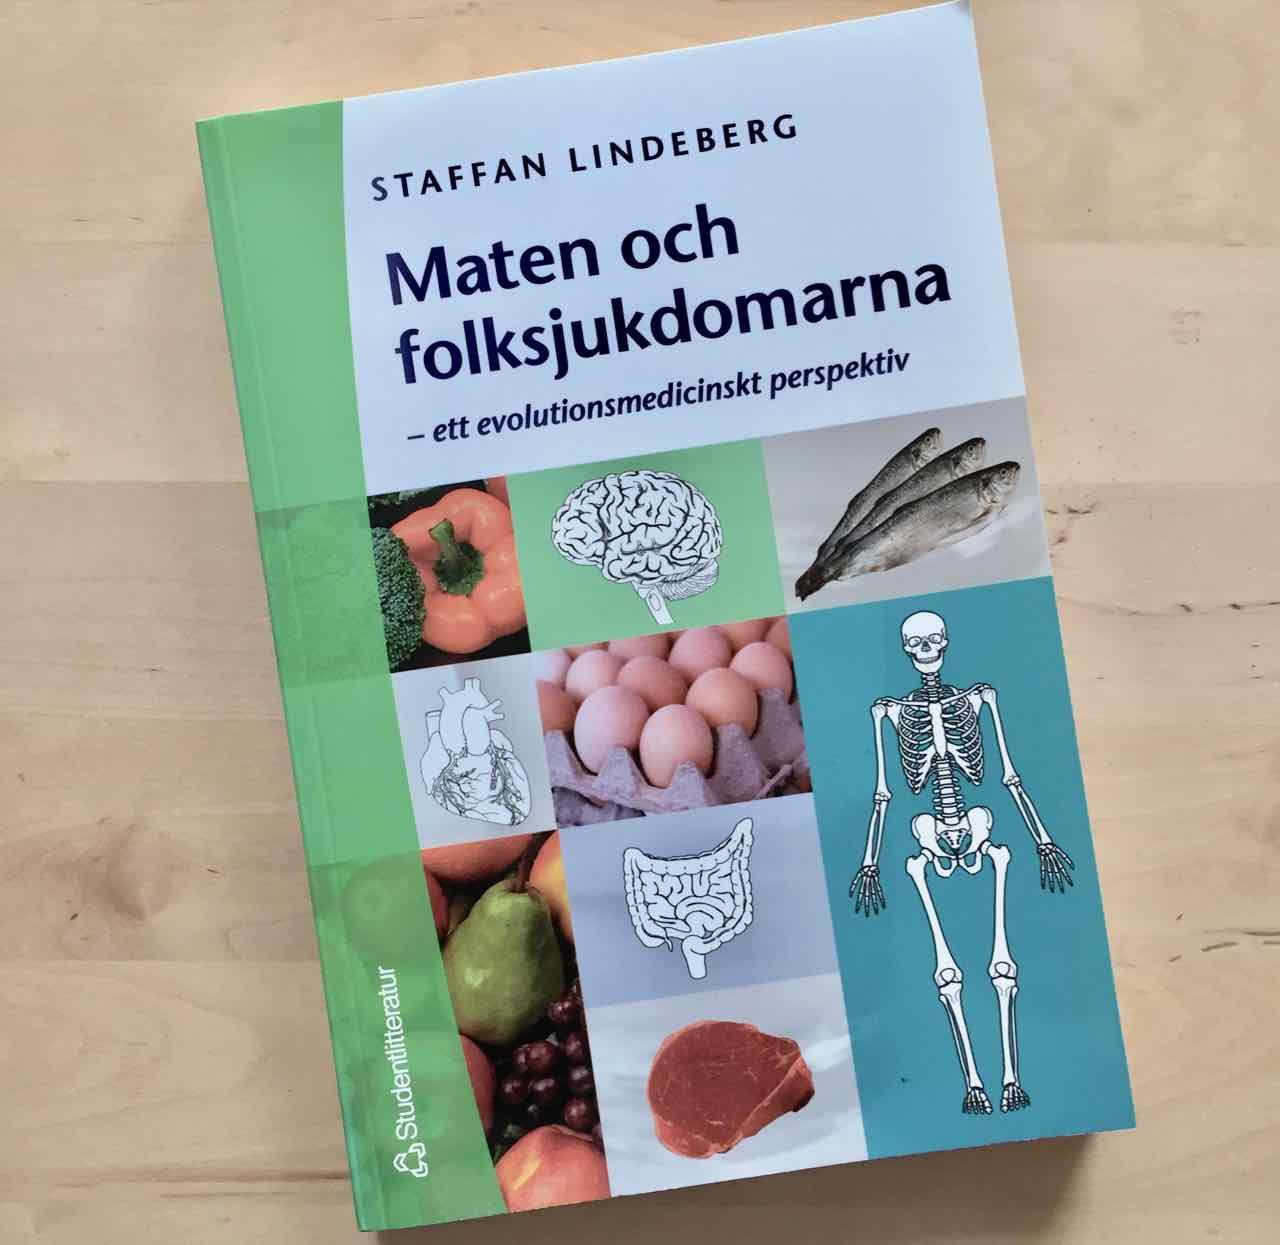 Staffan Lindeberg